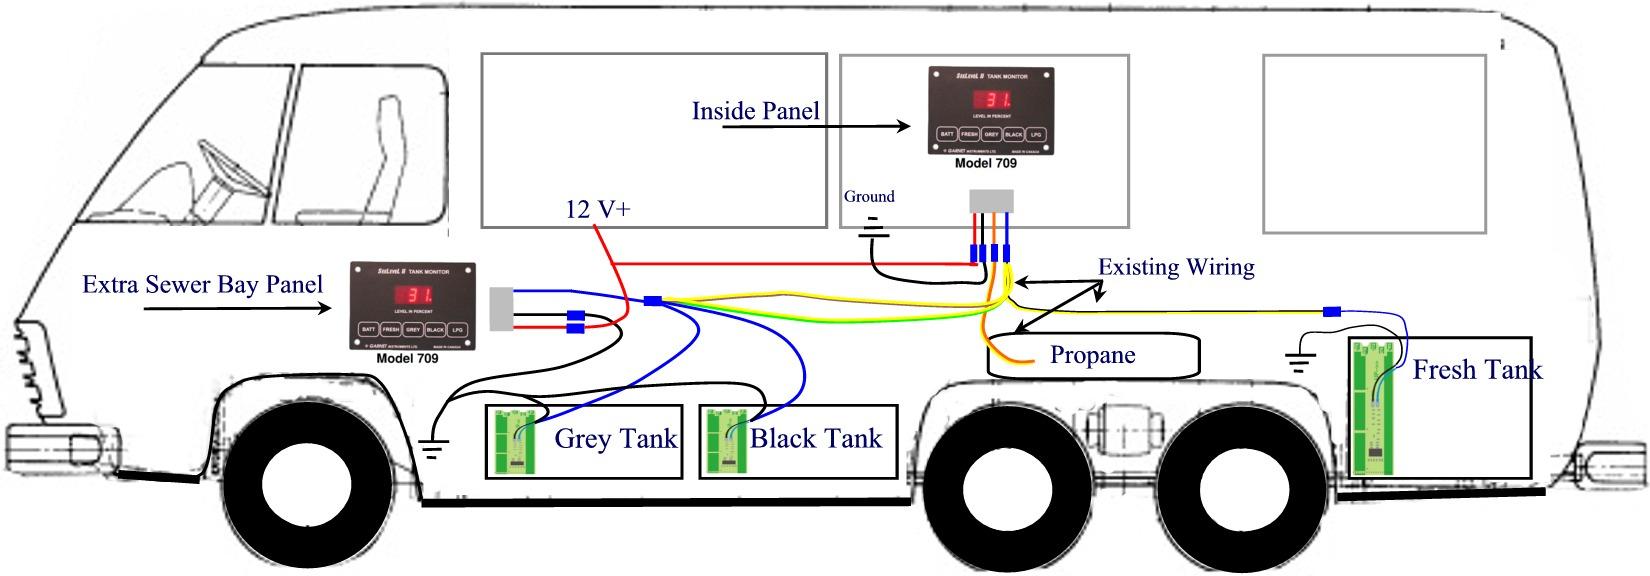 Rv Tank Monitor Wiring Diagram | Wiring Diagram - R V Plug Wiring Diagram